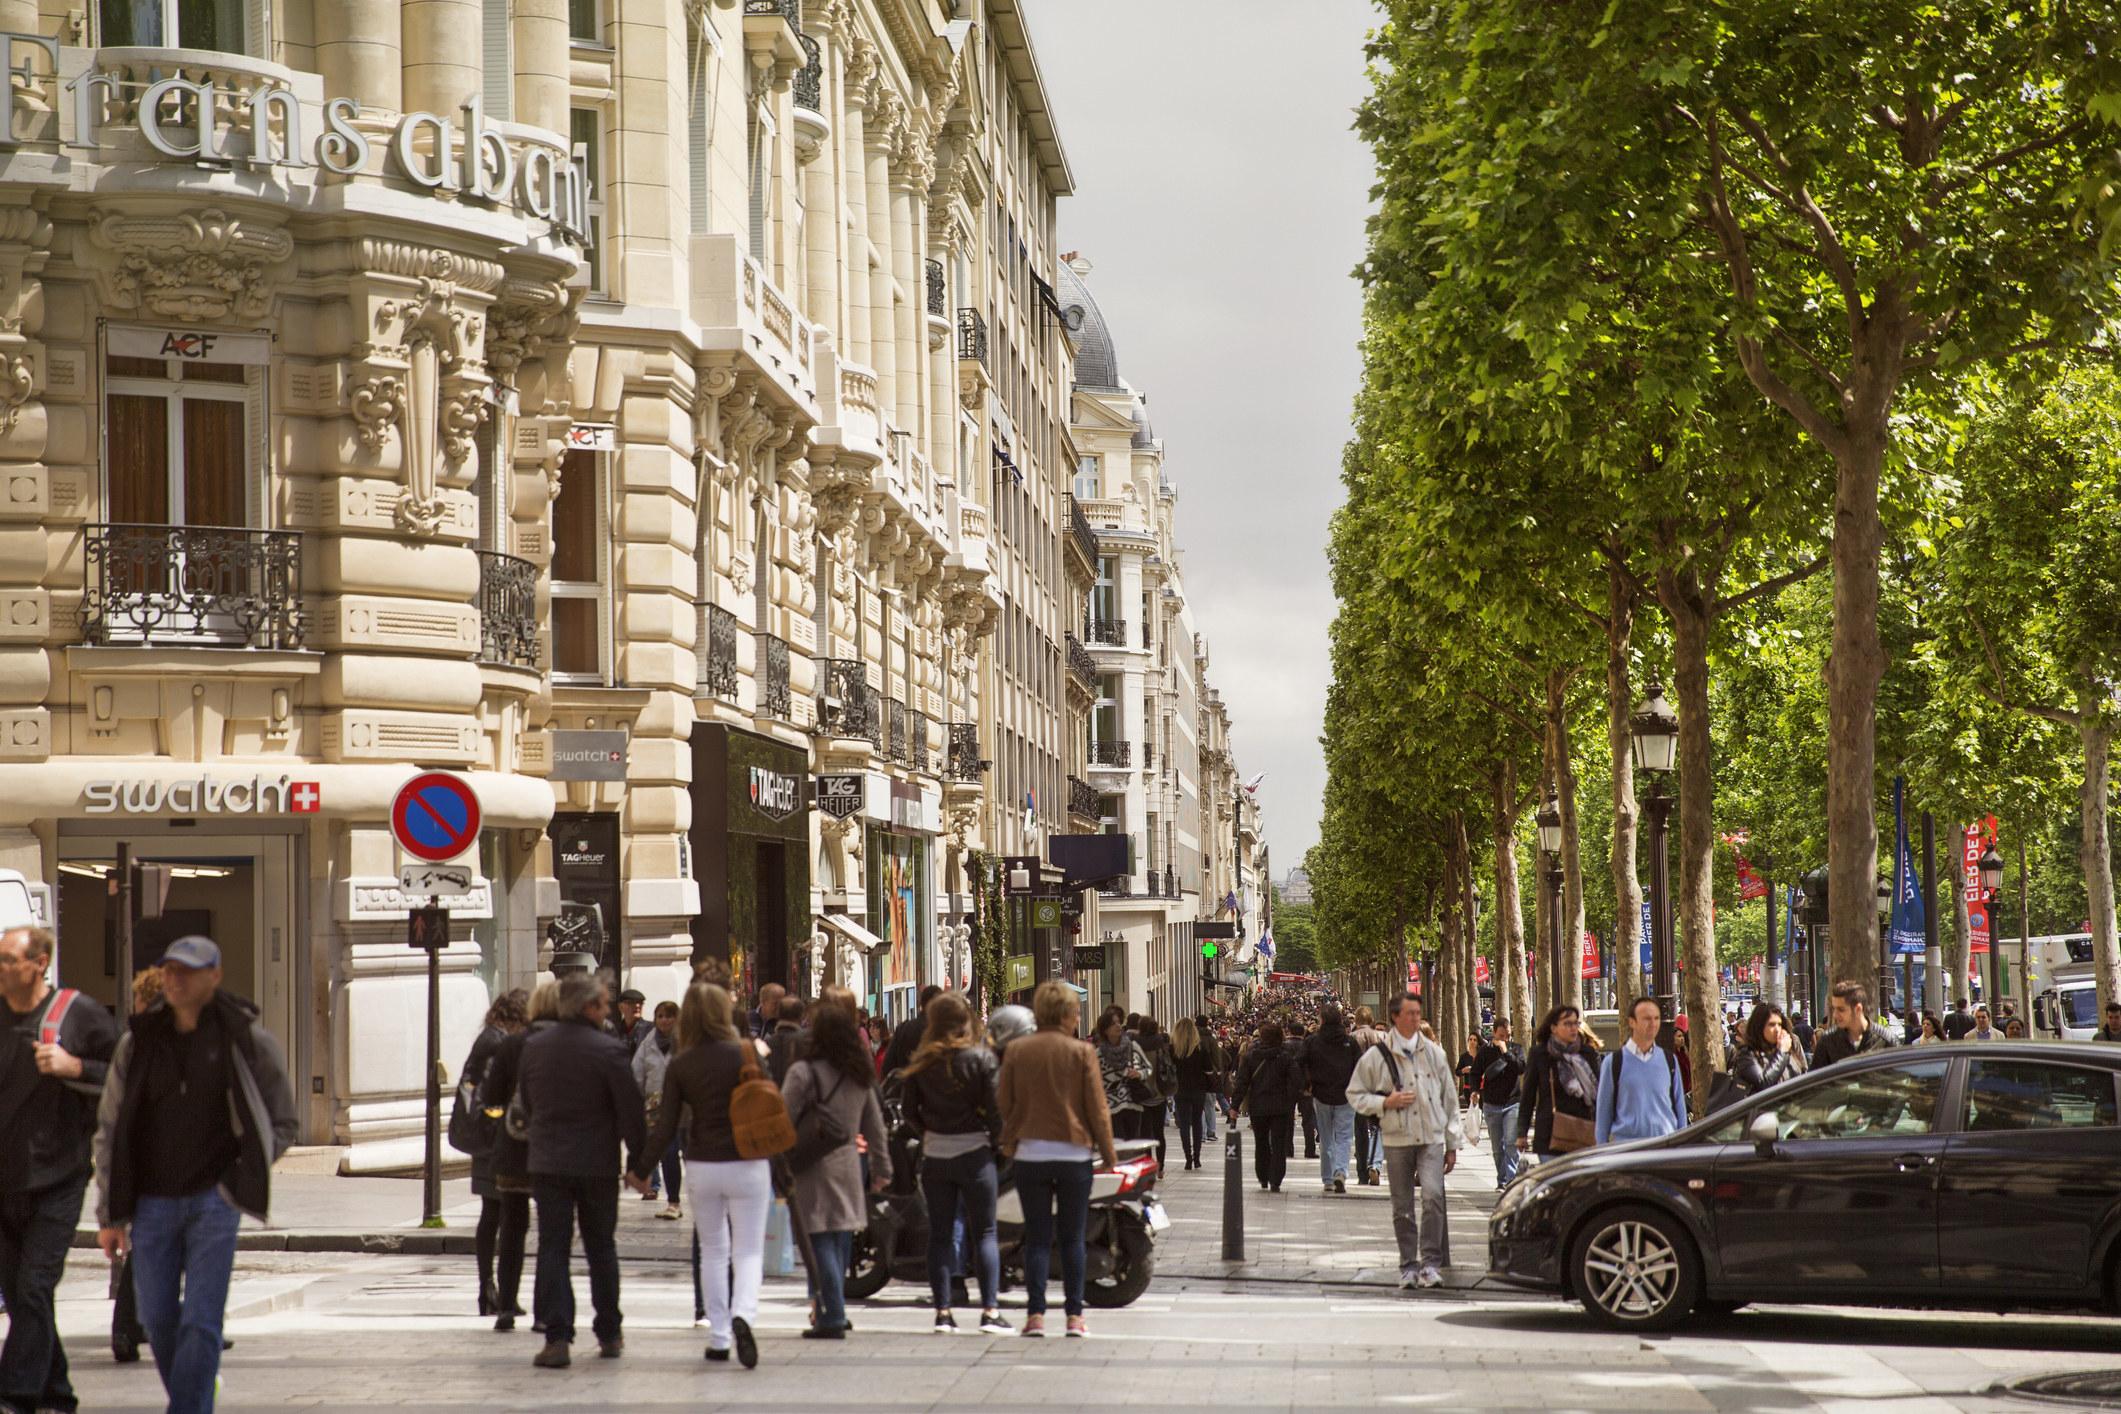 pedestrians walk down the busy Avenue des Champs-Elysees